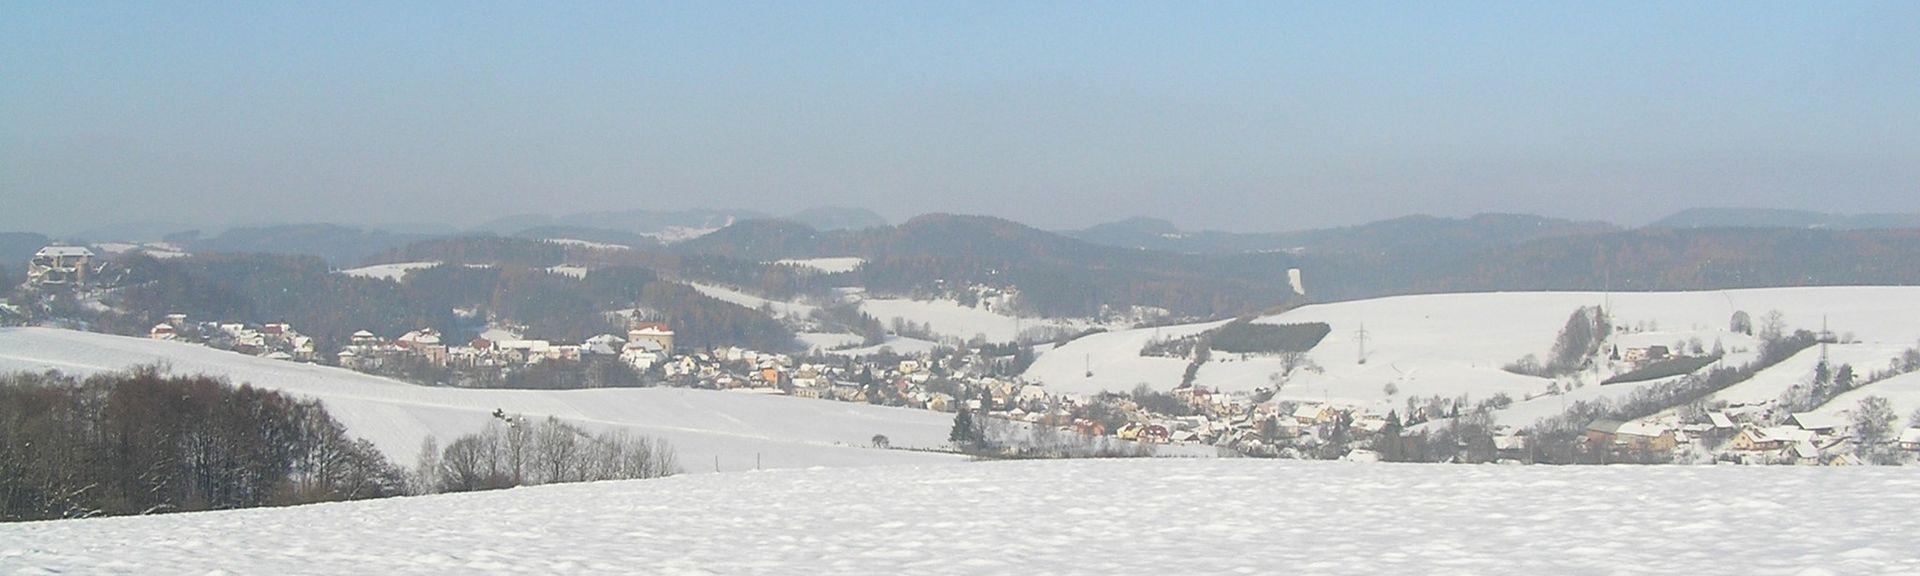 Horní Brusnice, Hradec Kralove Region, Tschechische Republik